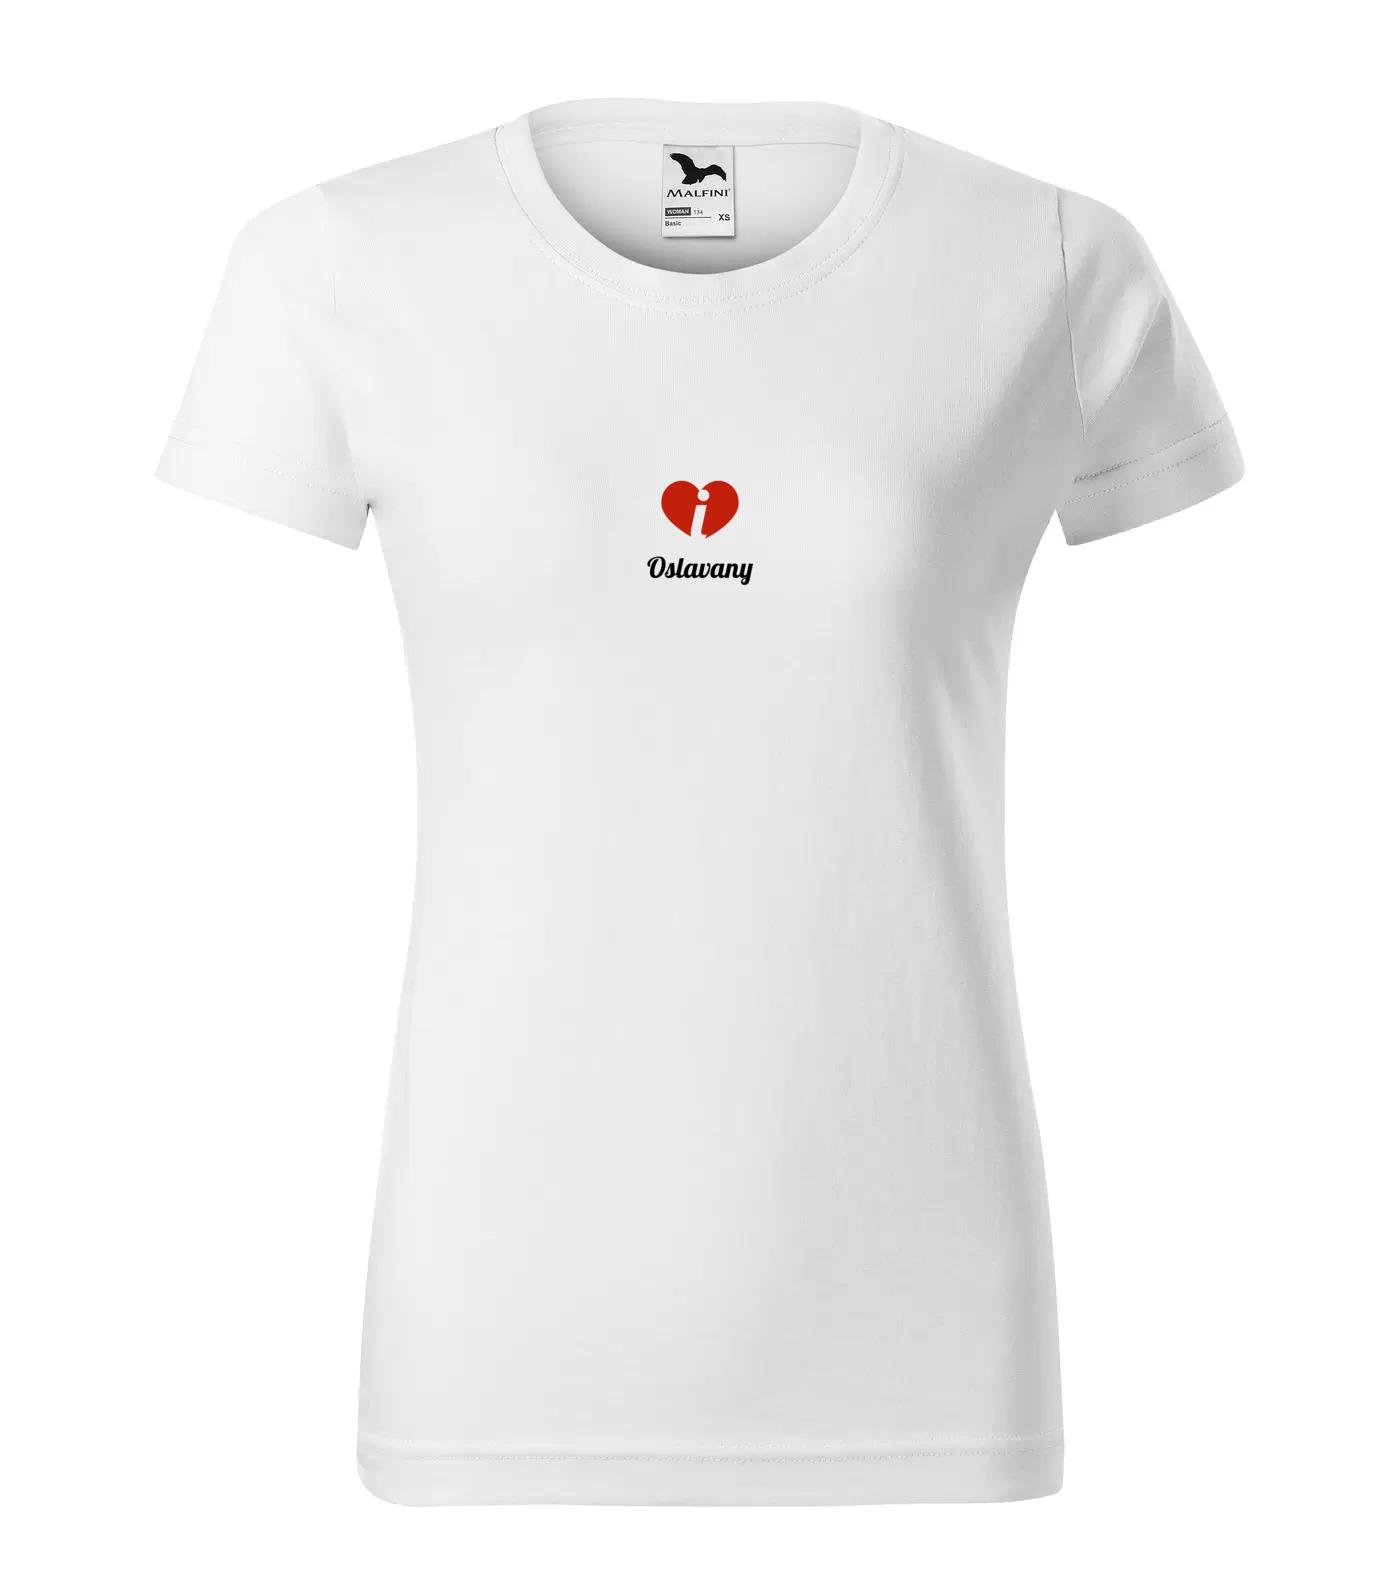 Tričko Oslavany